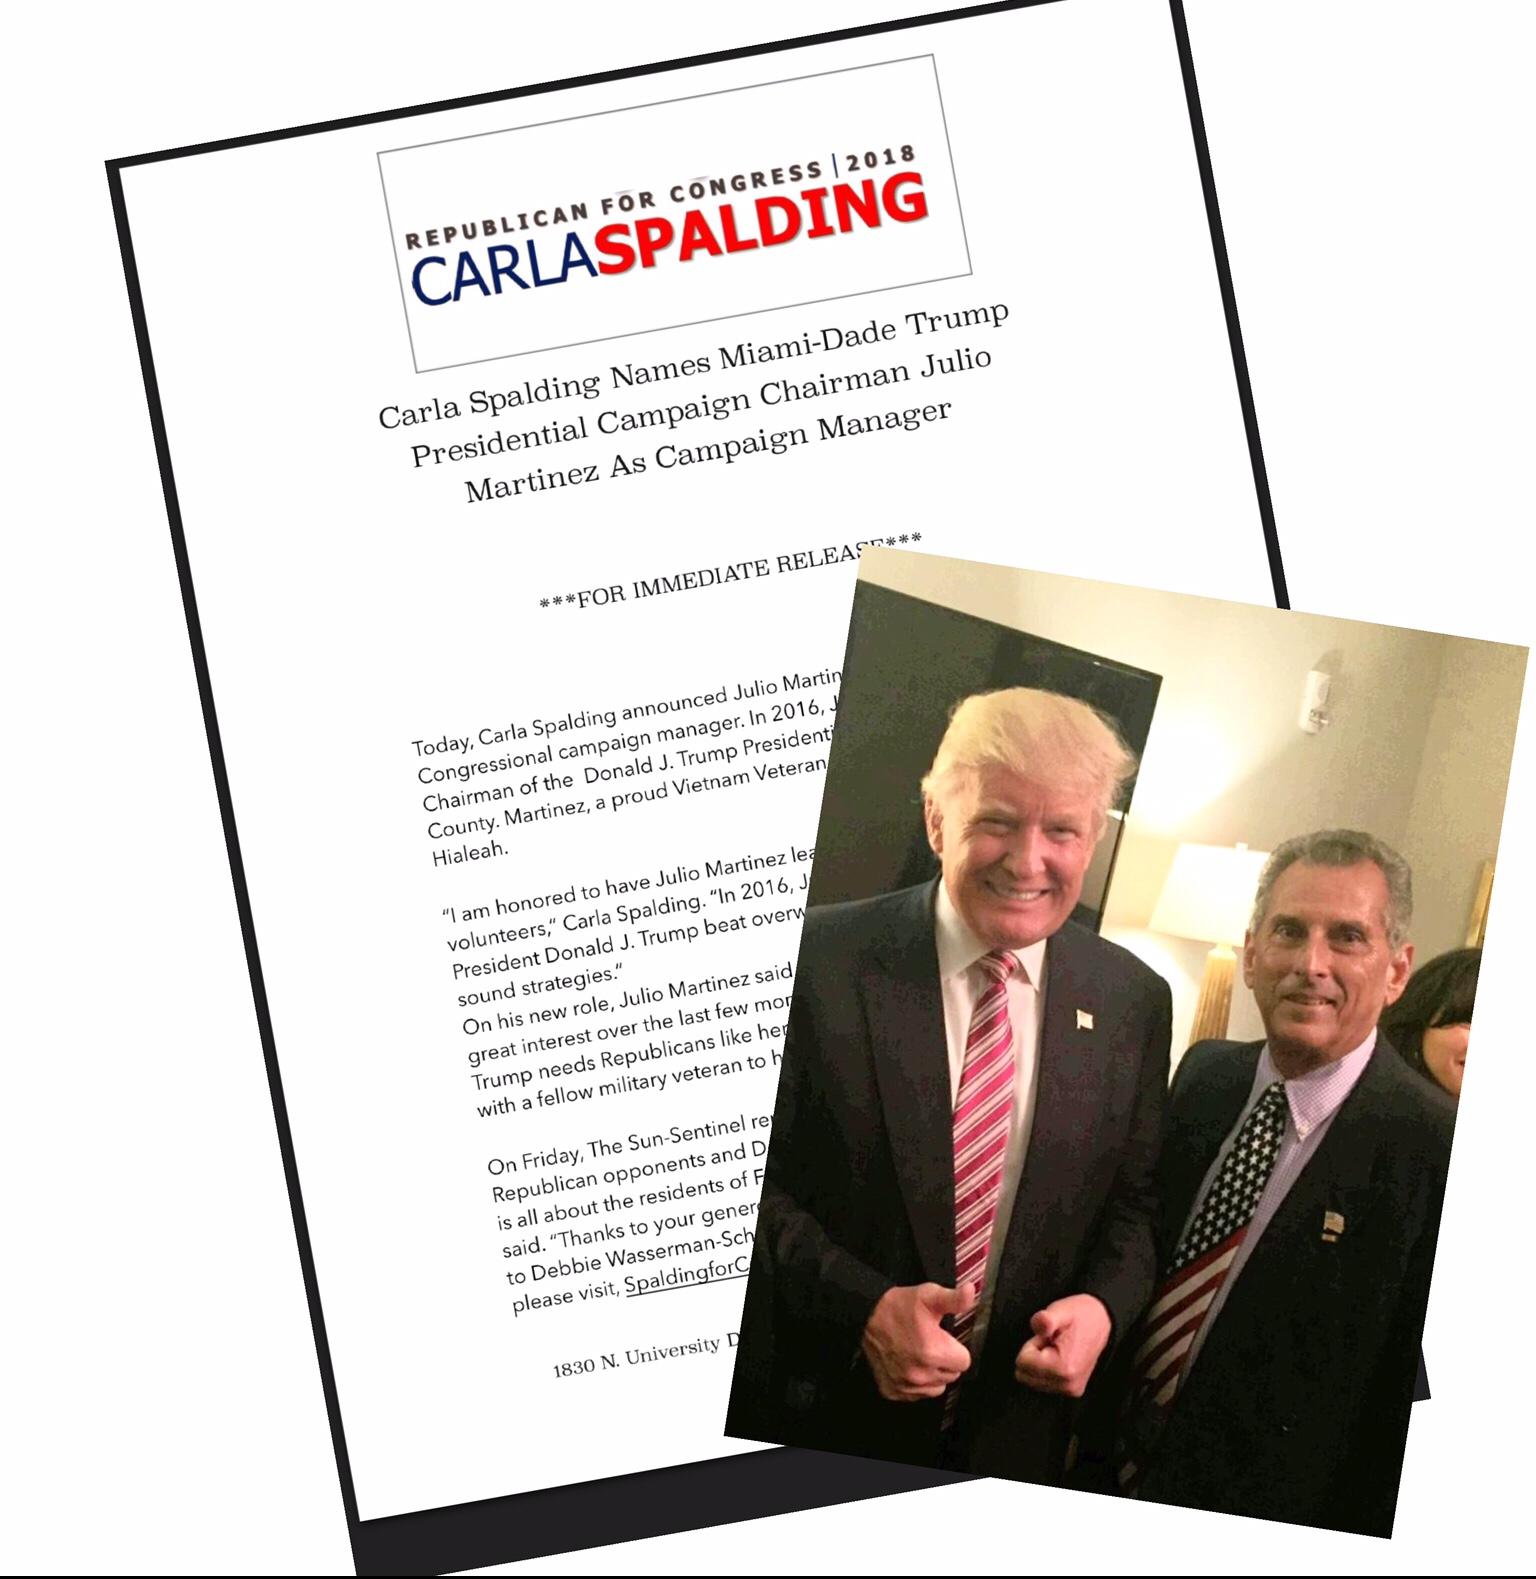 Republican Carla Spalding Raises More Money Than Debbie Wasserman